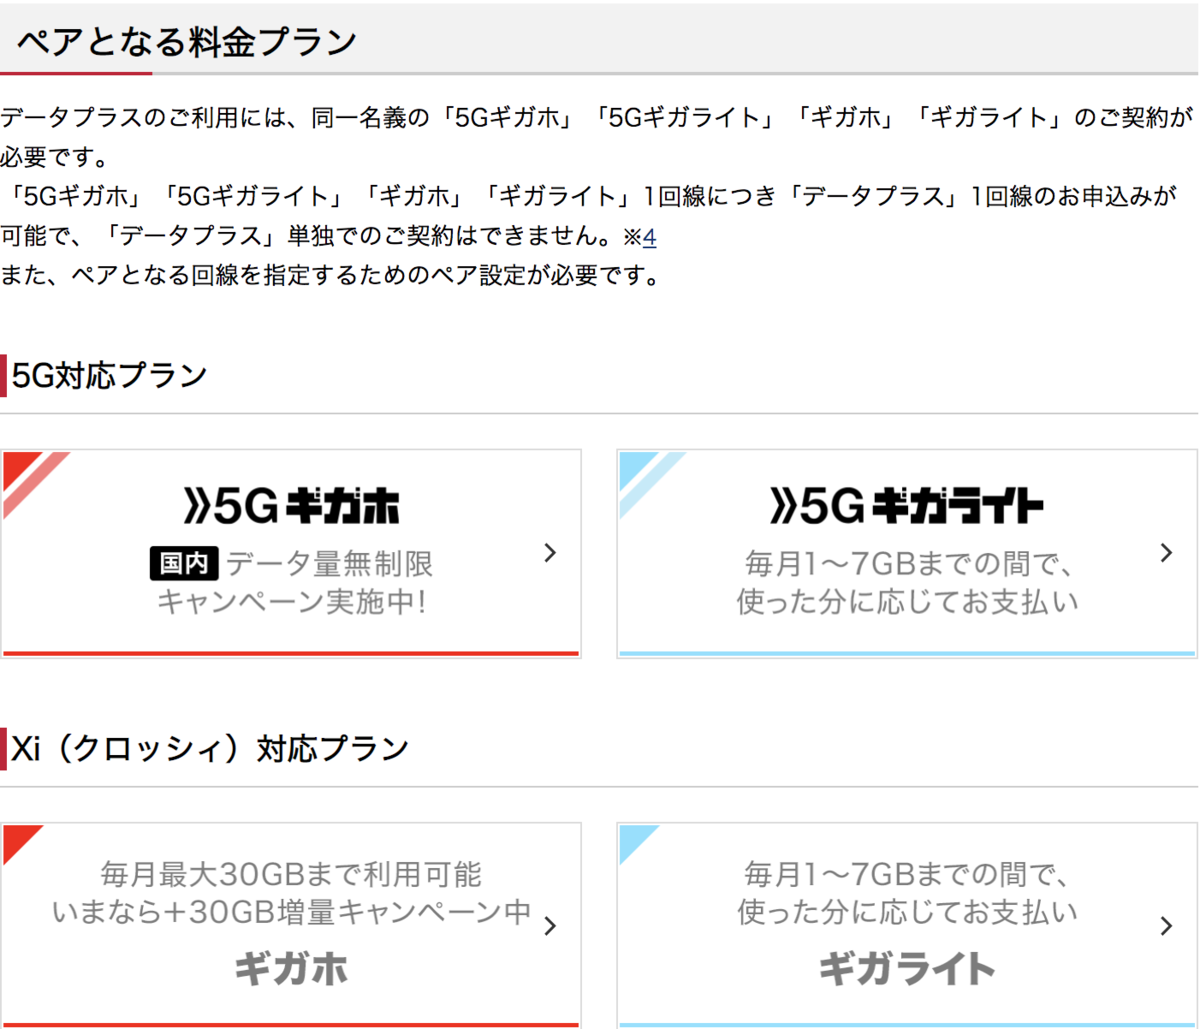 f:id:koiwai_chinatsu:20200324182247p:plain